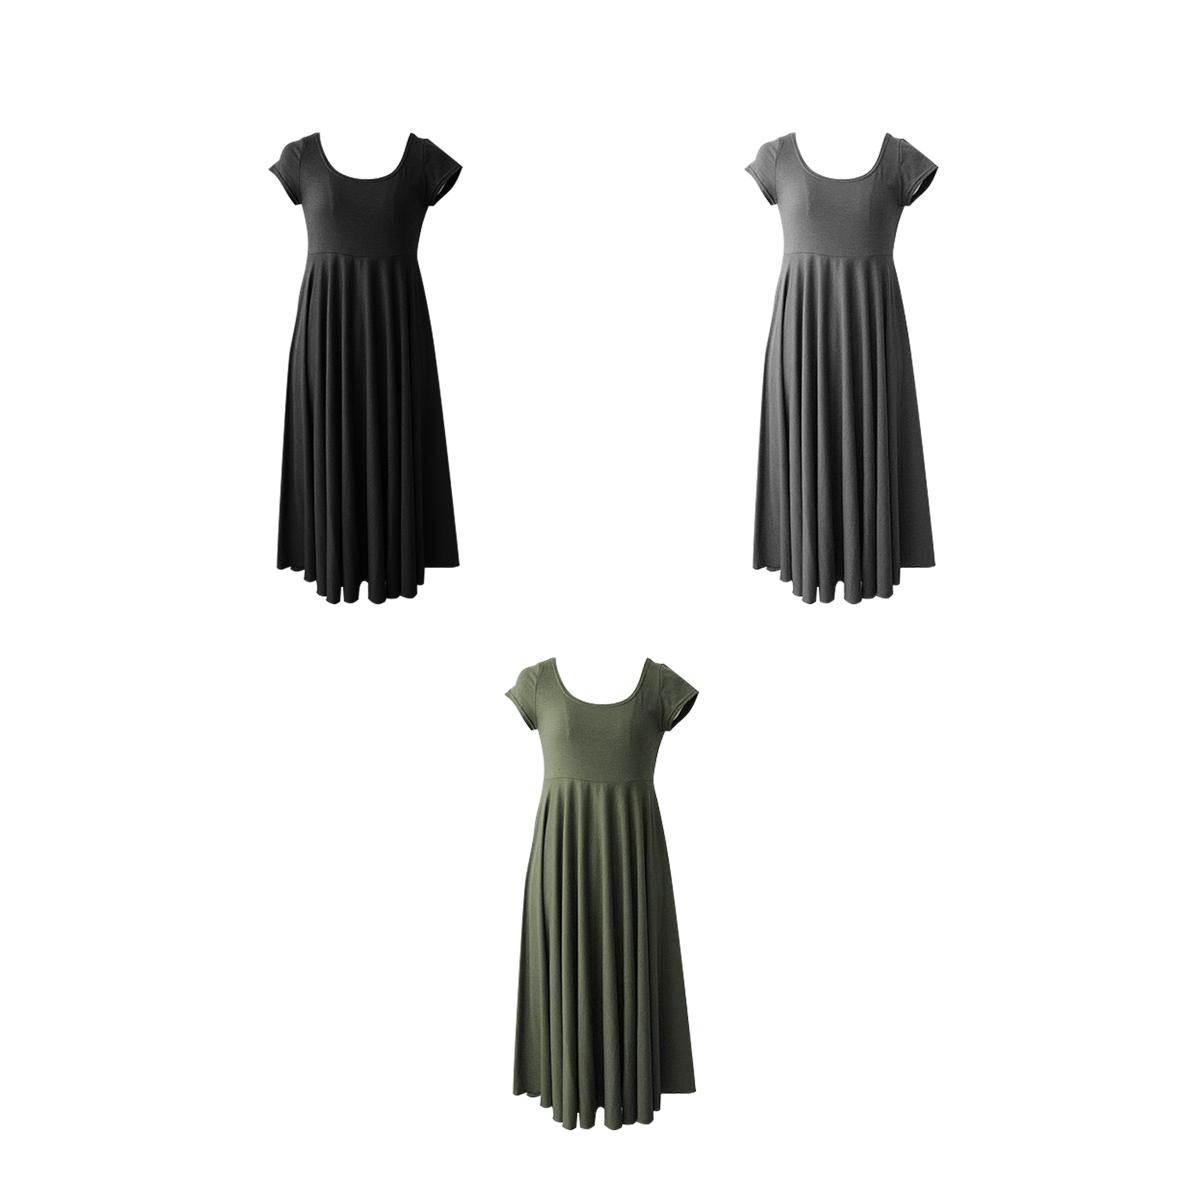 IAG-Short-Sleeve-Maternity-Dress-Hero-2-1200×1200